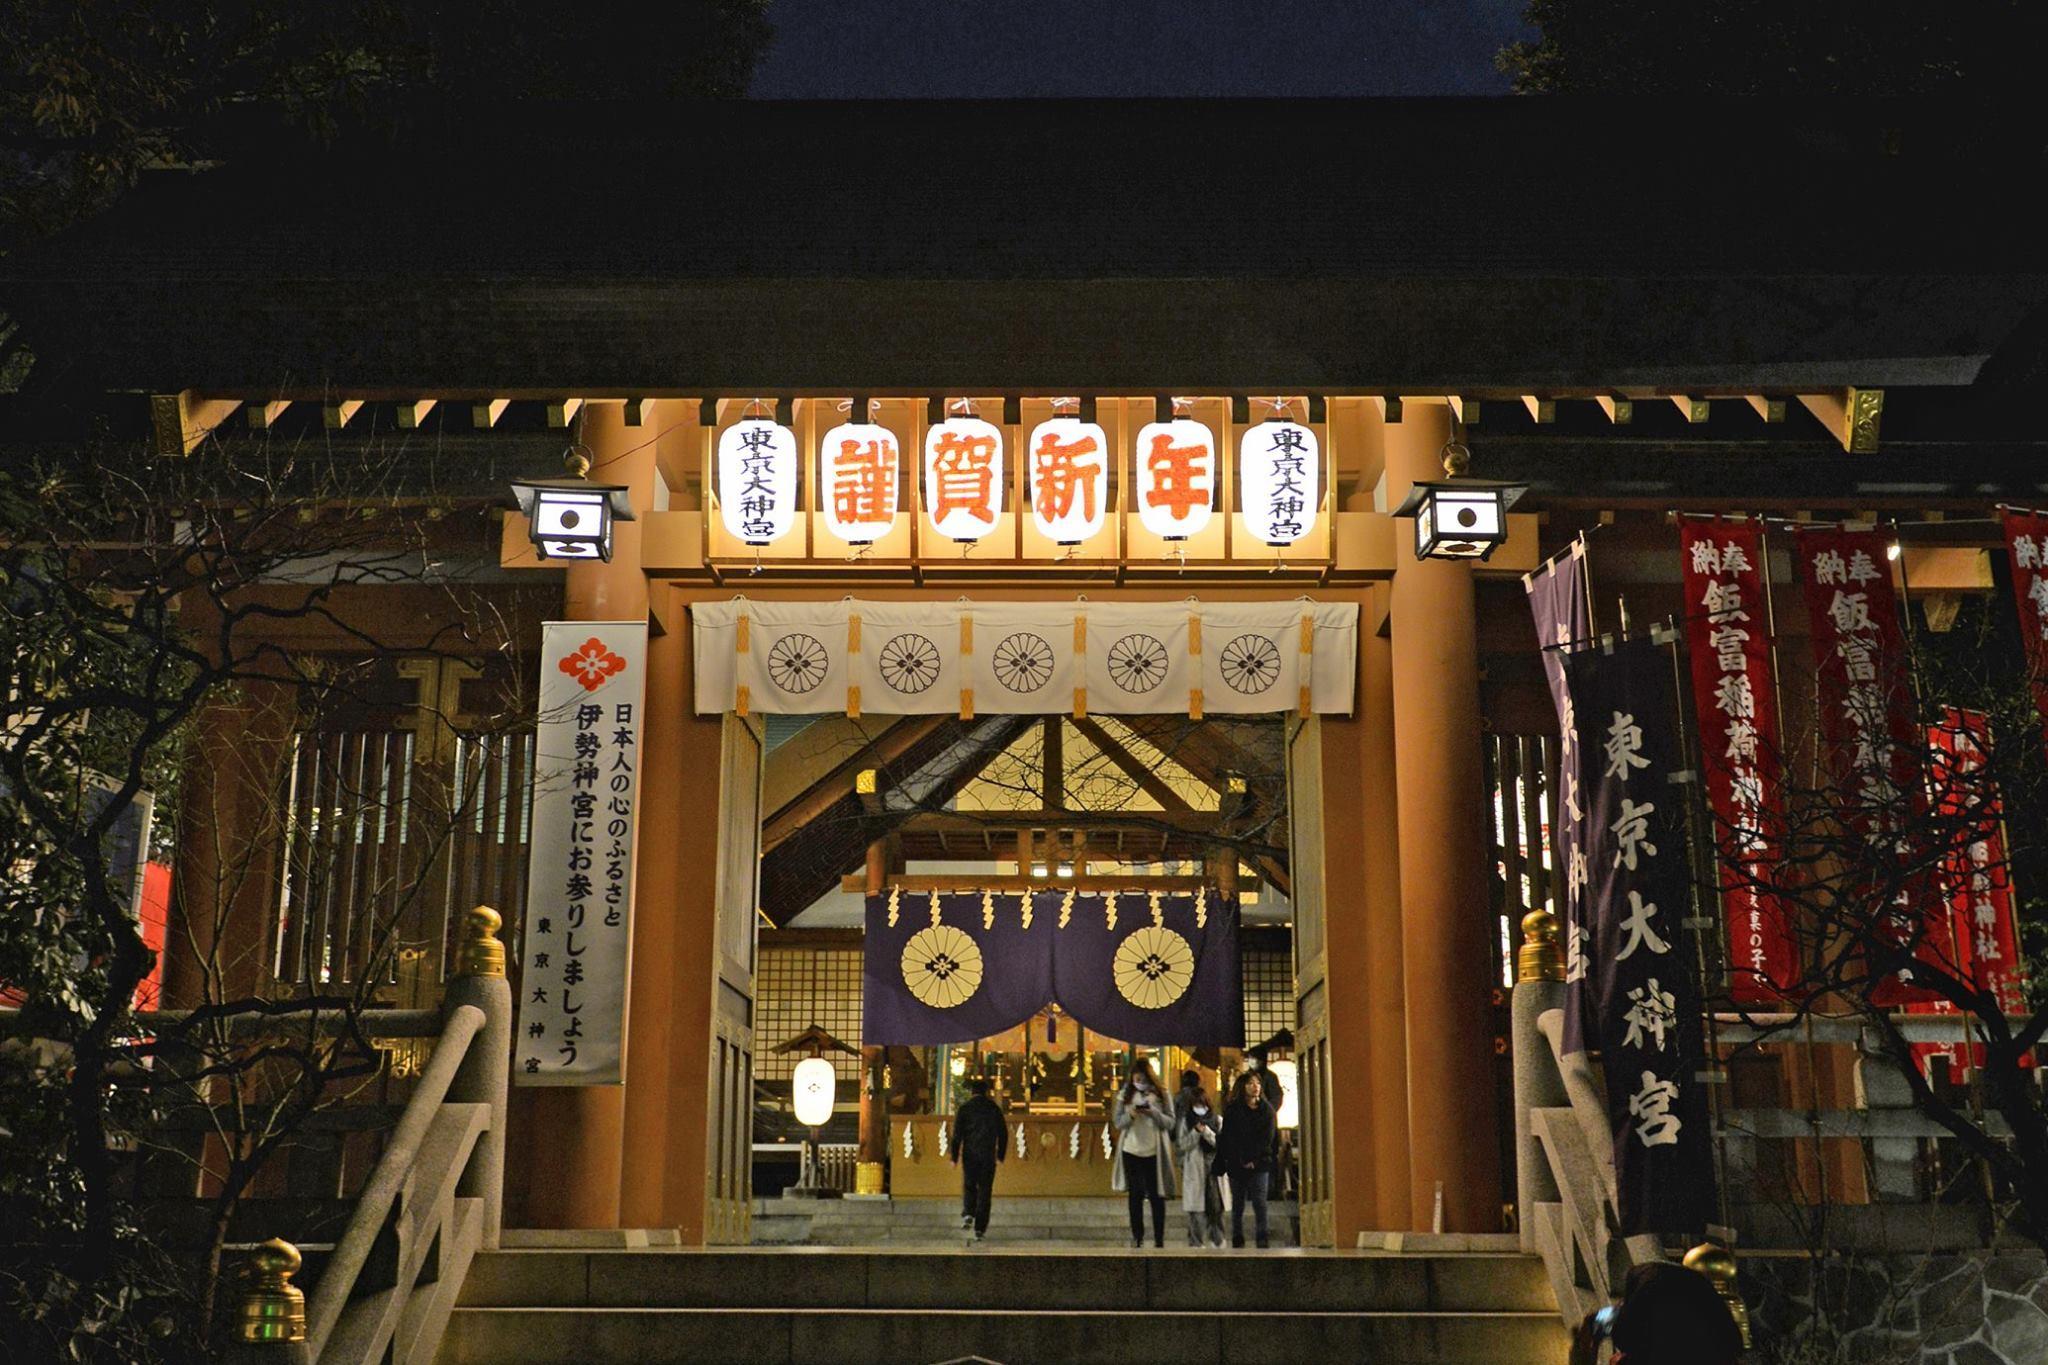 tokyo daijingu new year